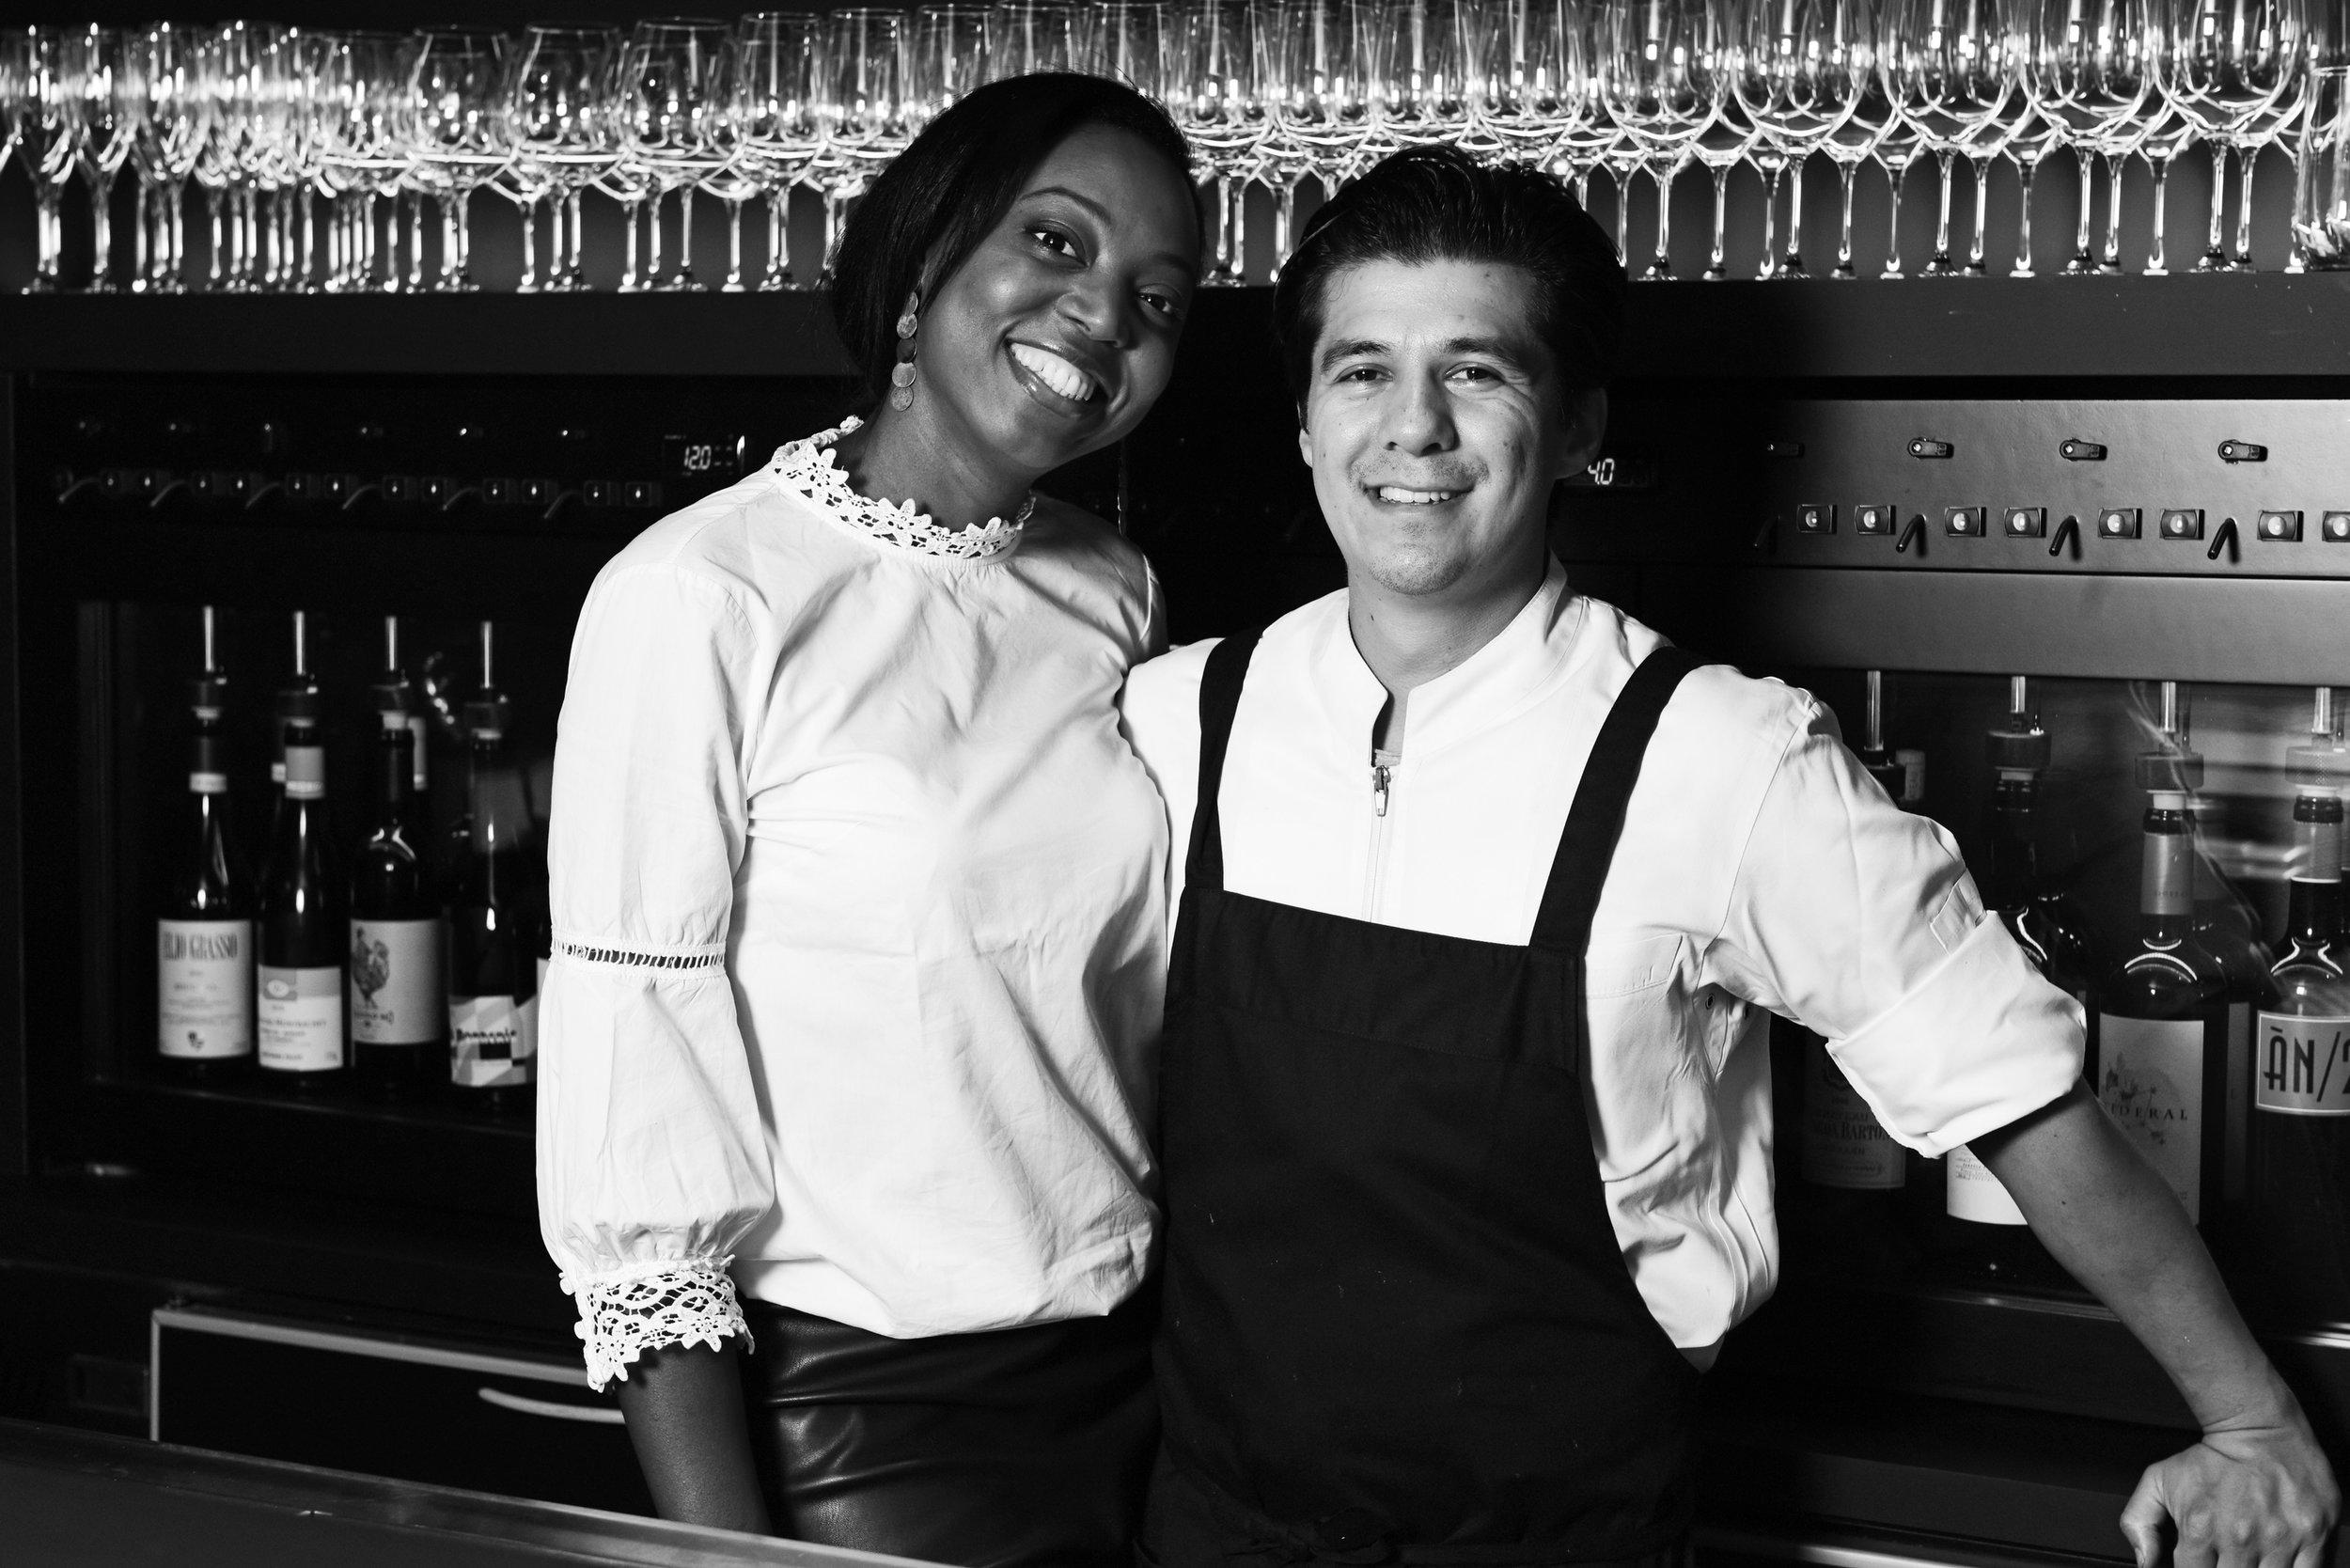 37 vinum sensum knokke wijnbar restaurant tablefever bart albrecht food culinair fotograaf.jpg